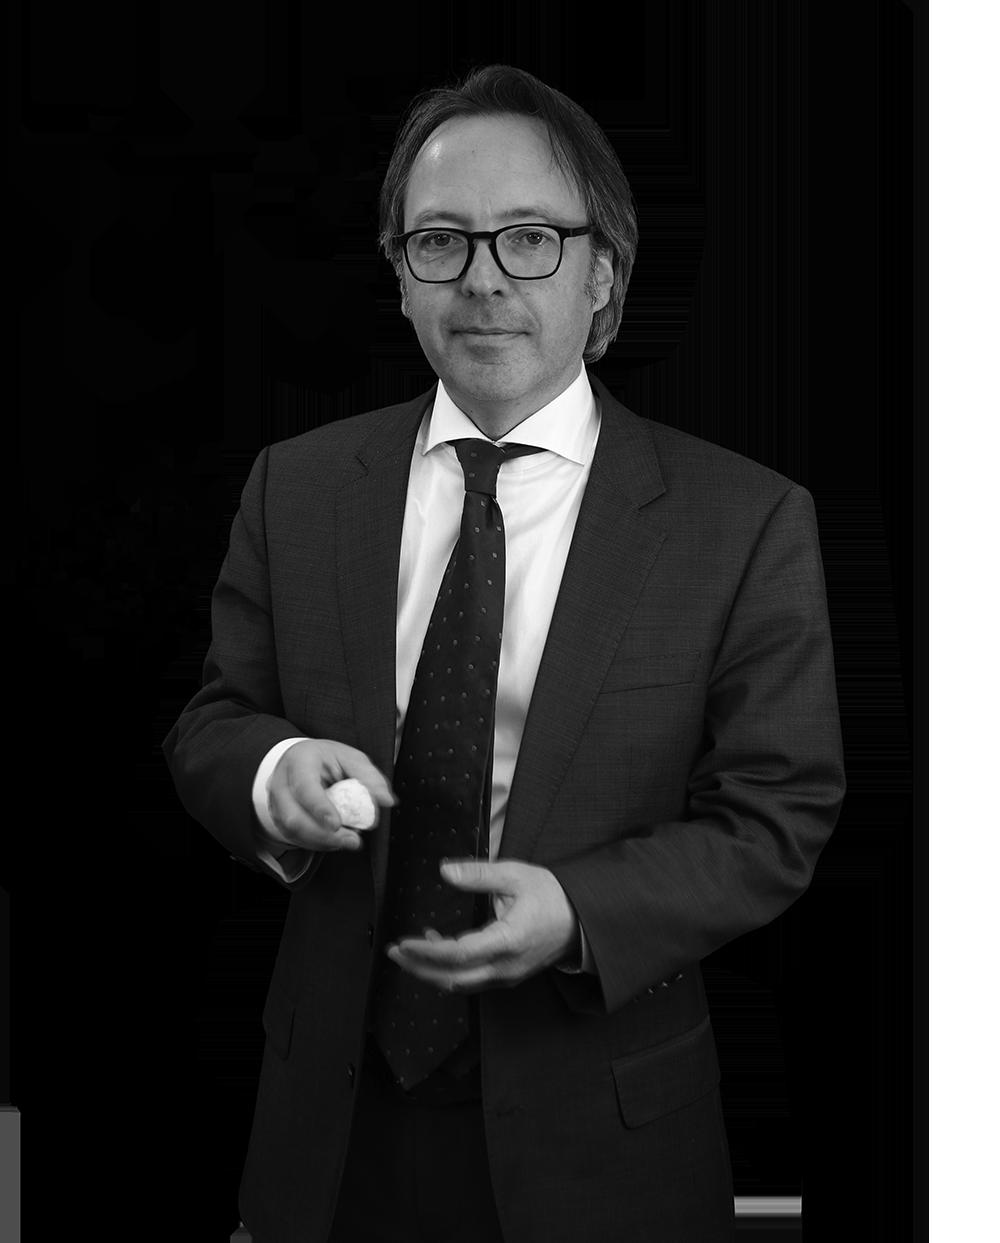 Me Vincent Kaltenback, avocat | Membre de l'équipe Barrette & Associés | Avocats